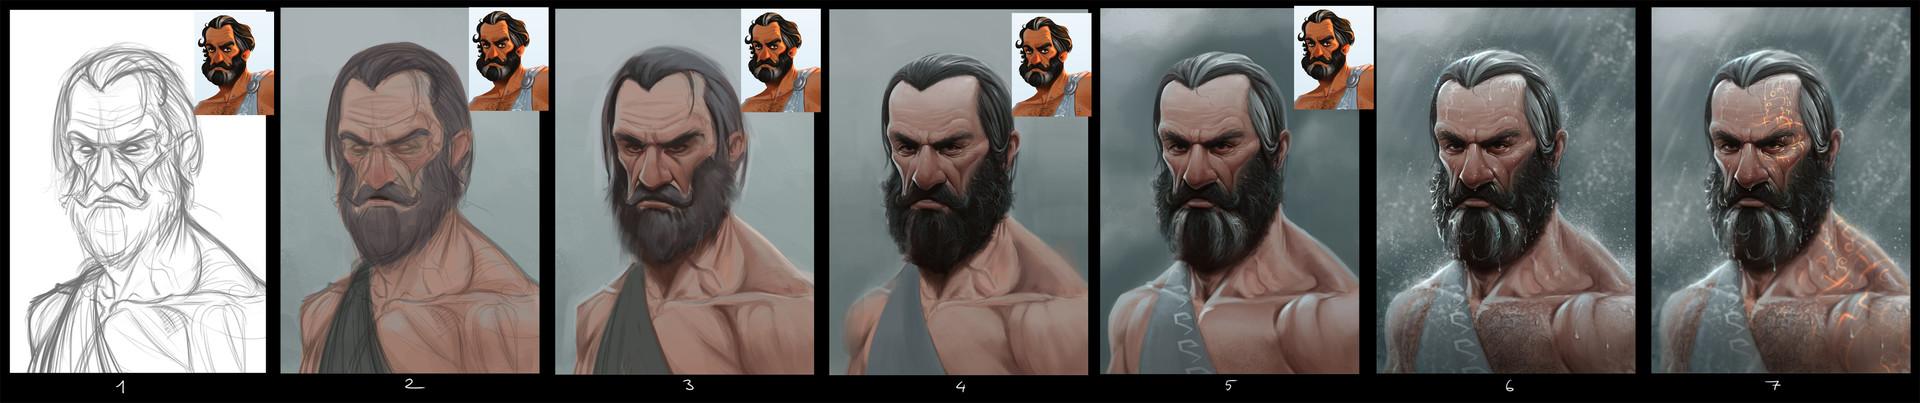 Erkan karagoez odysseus portrait process